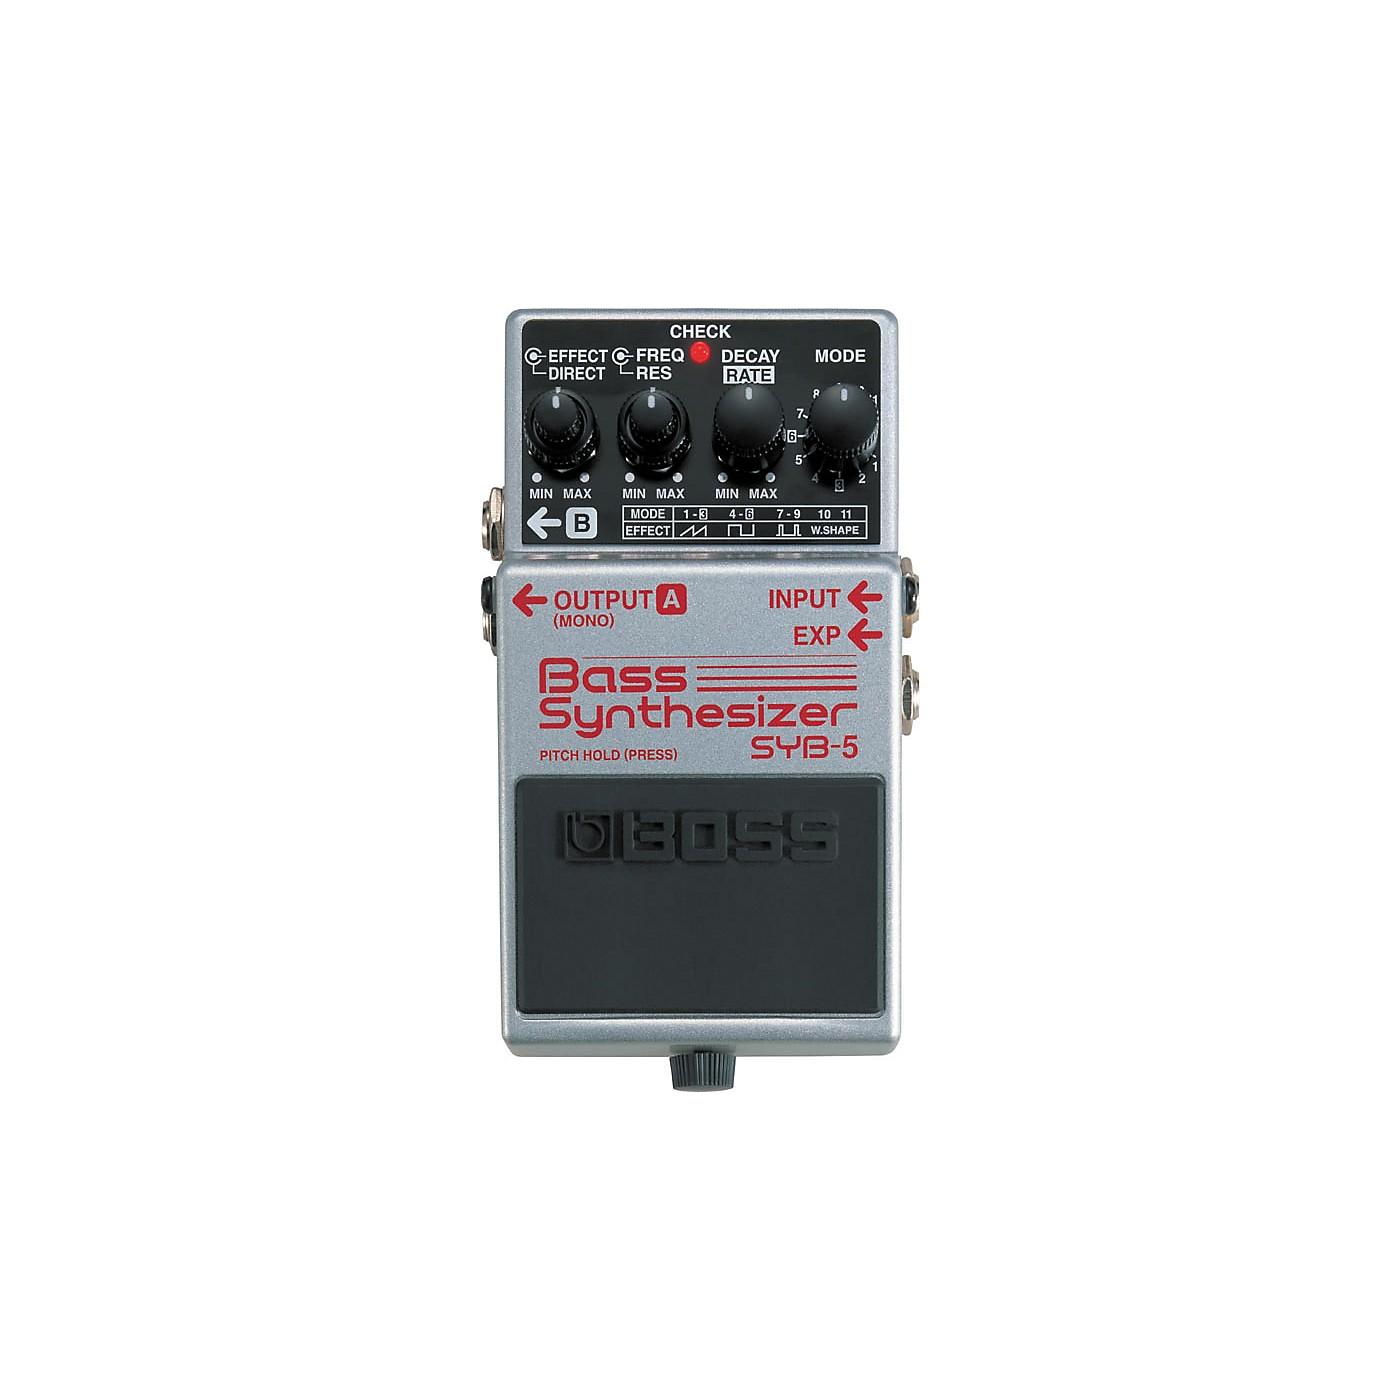 Boss SYB-5 Bass Synthesizer thumbnail